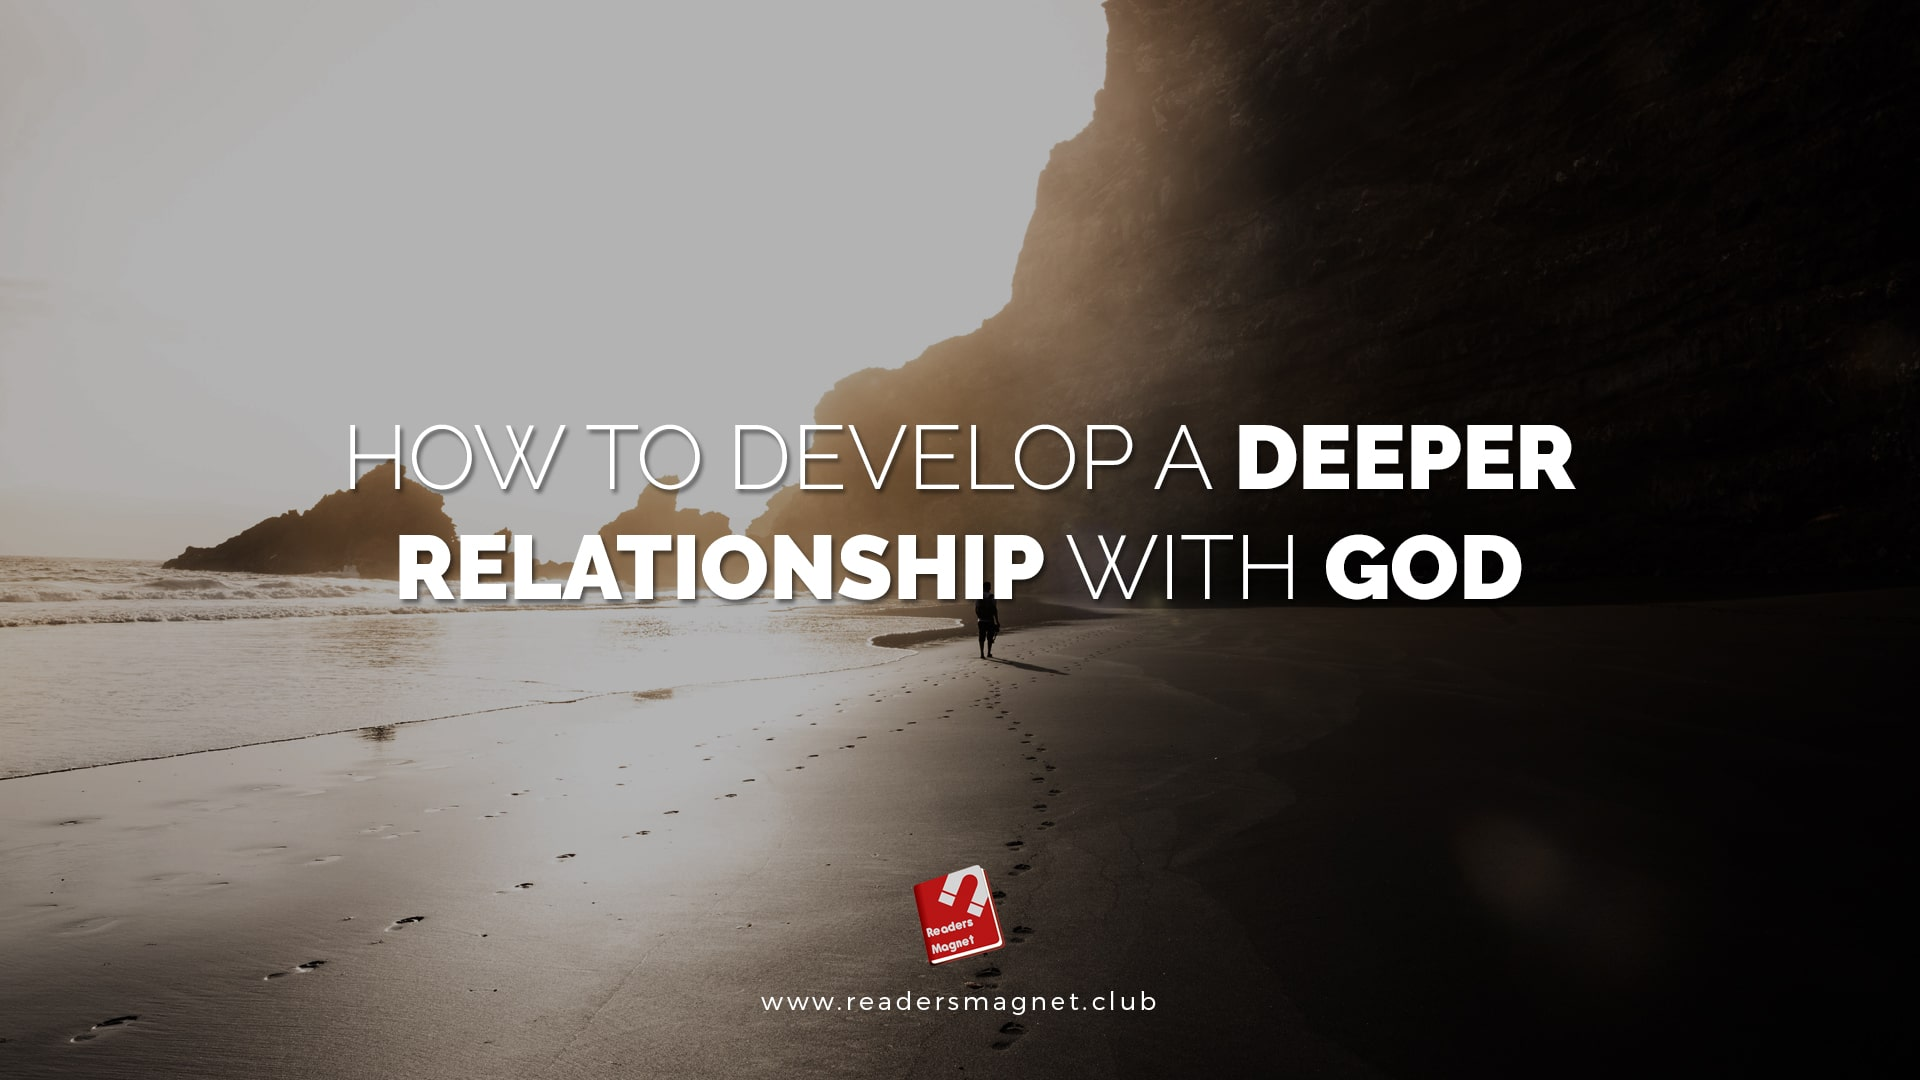 Develop deeper relationship with god banner